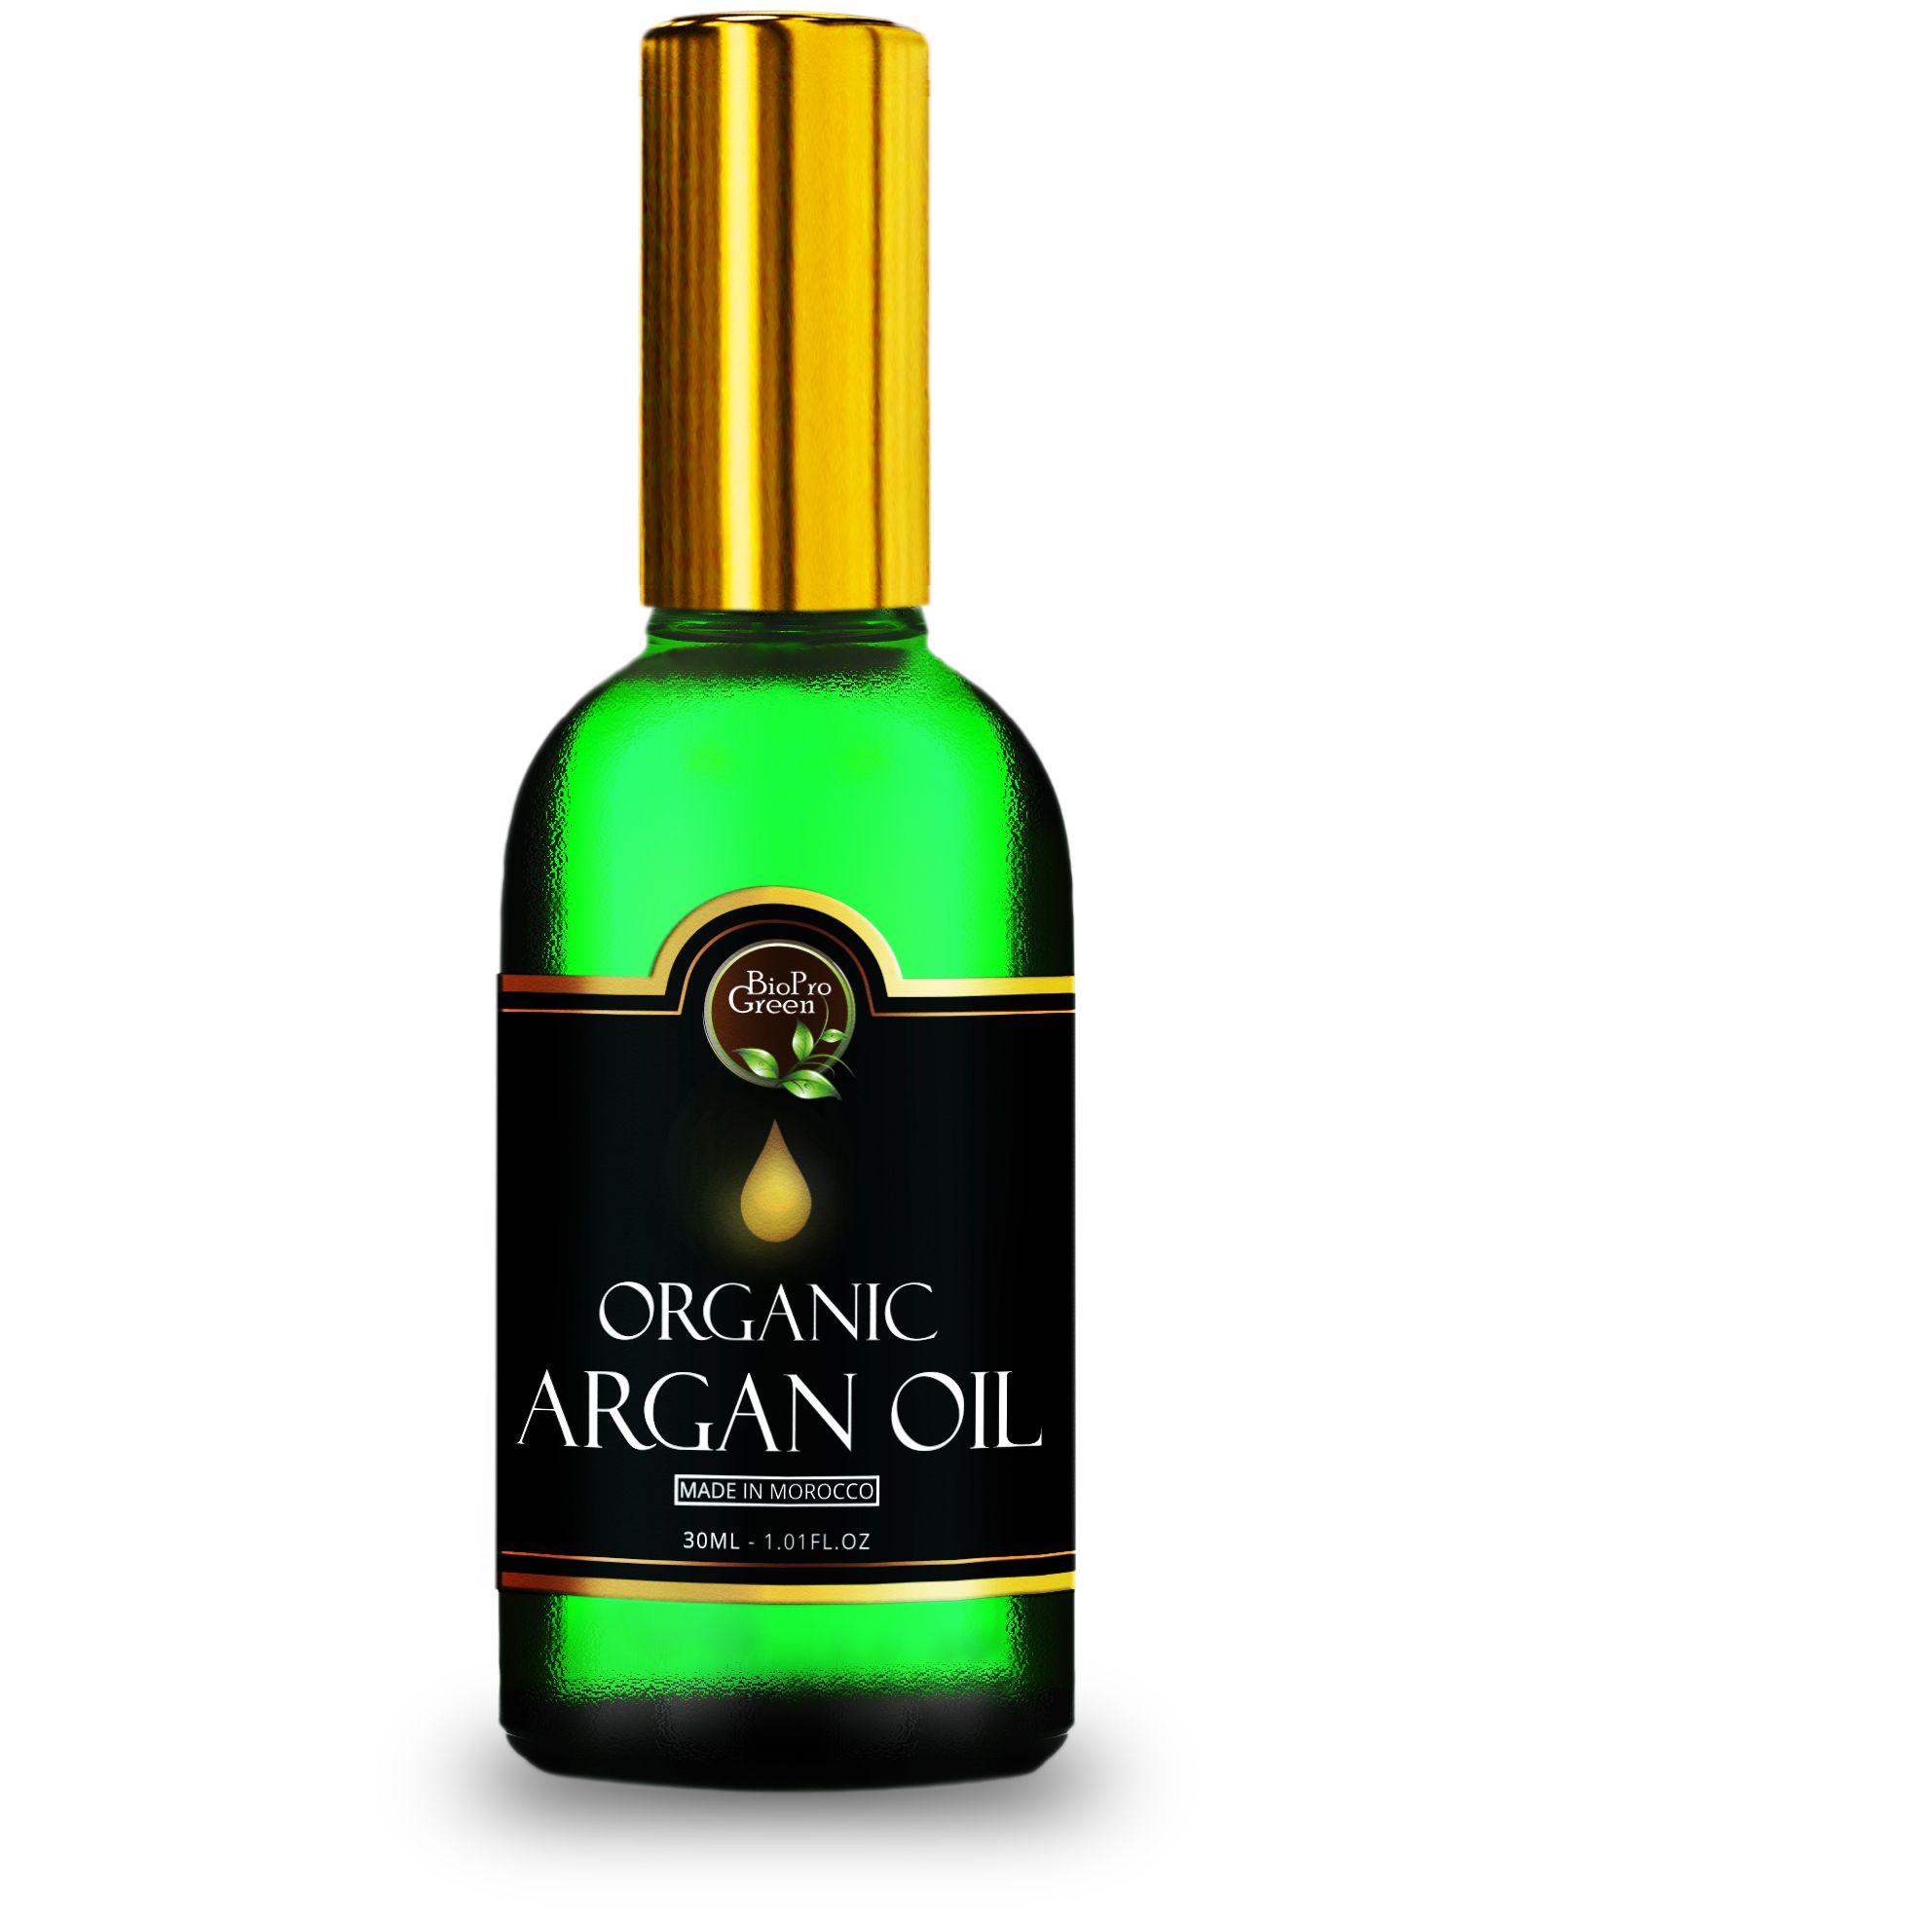 100% pure argan oil , Rich in Vitamin E cerified organic .